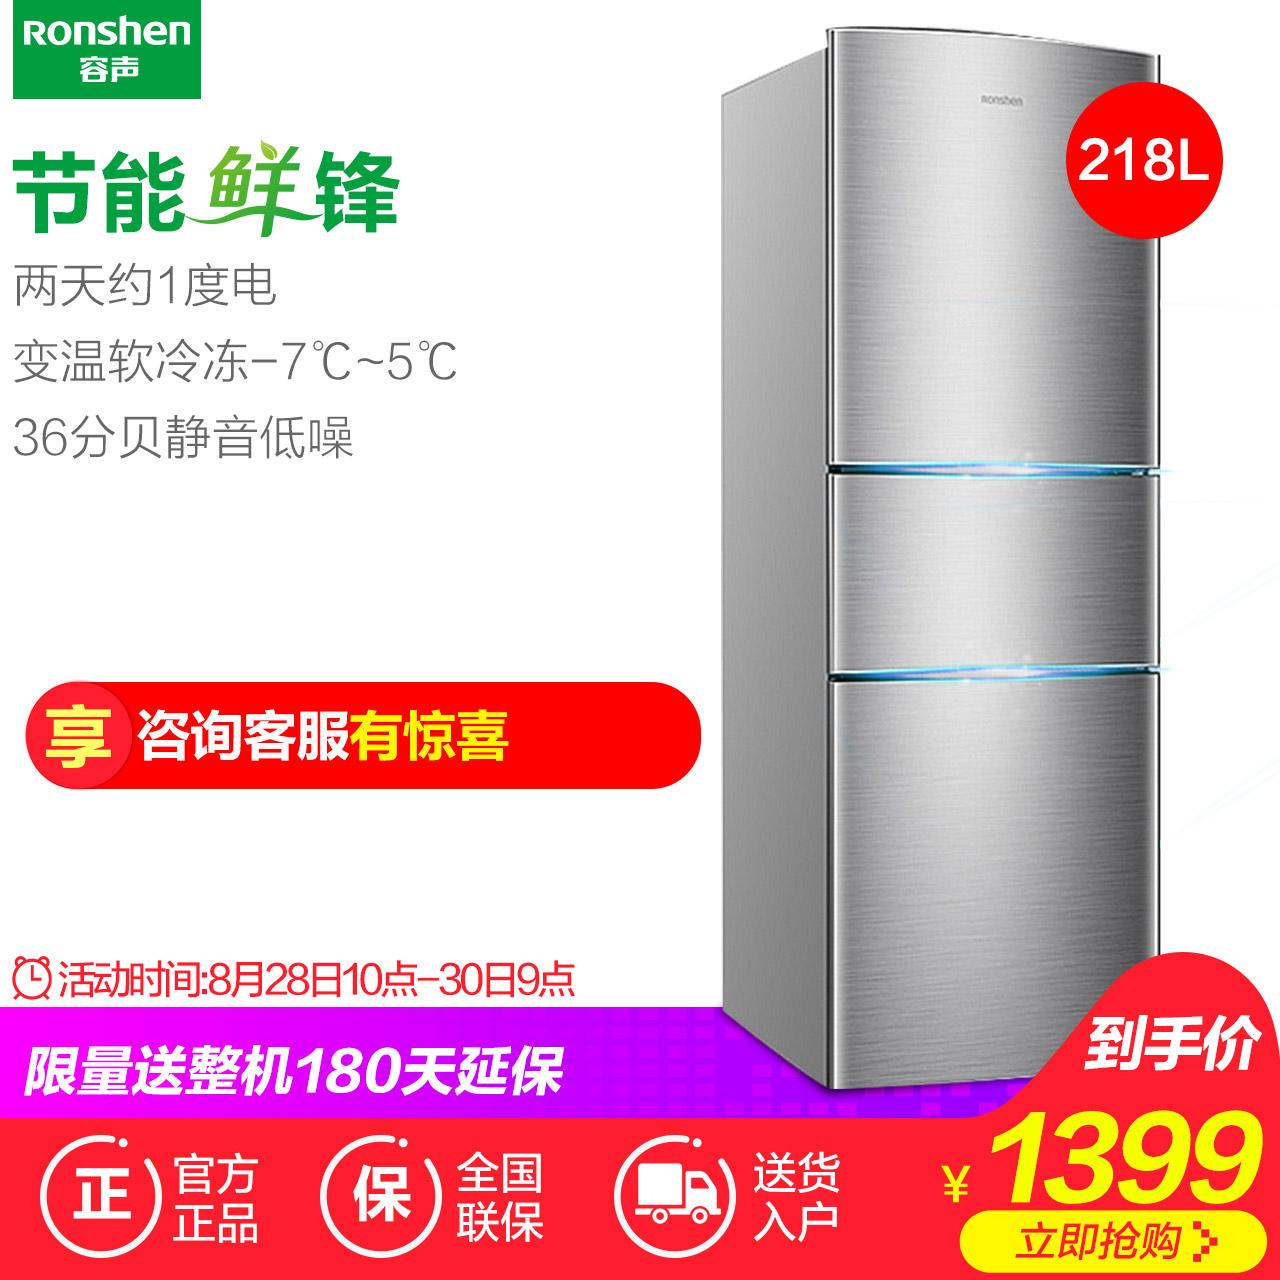 Ronshen/容声 BCD-218D11N 三开门电冰箱三门家用小型节能冰箱